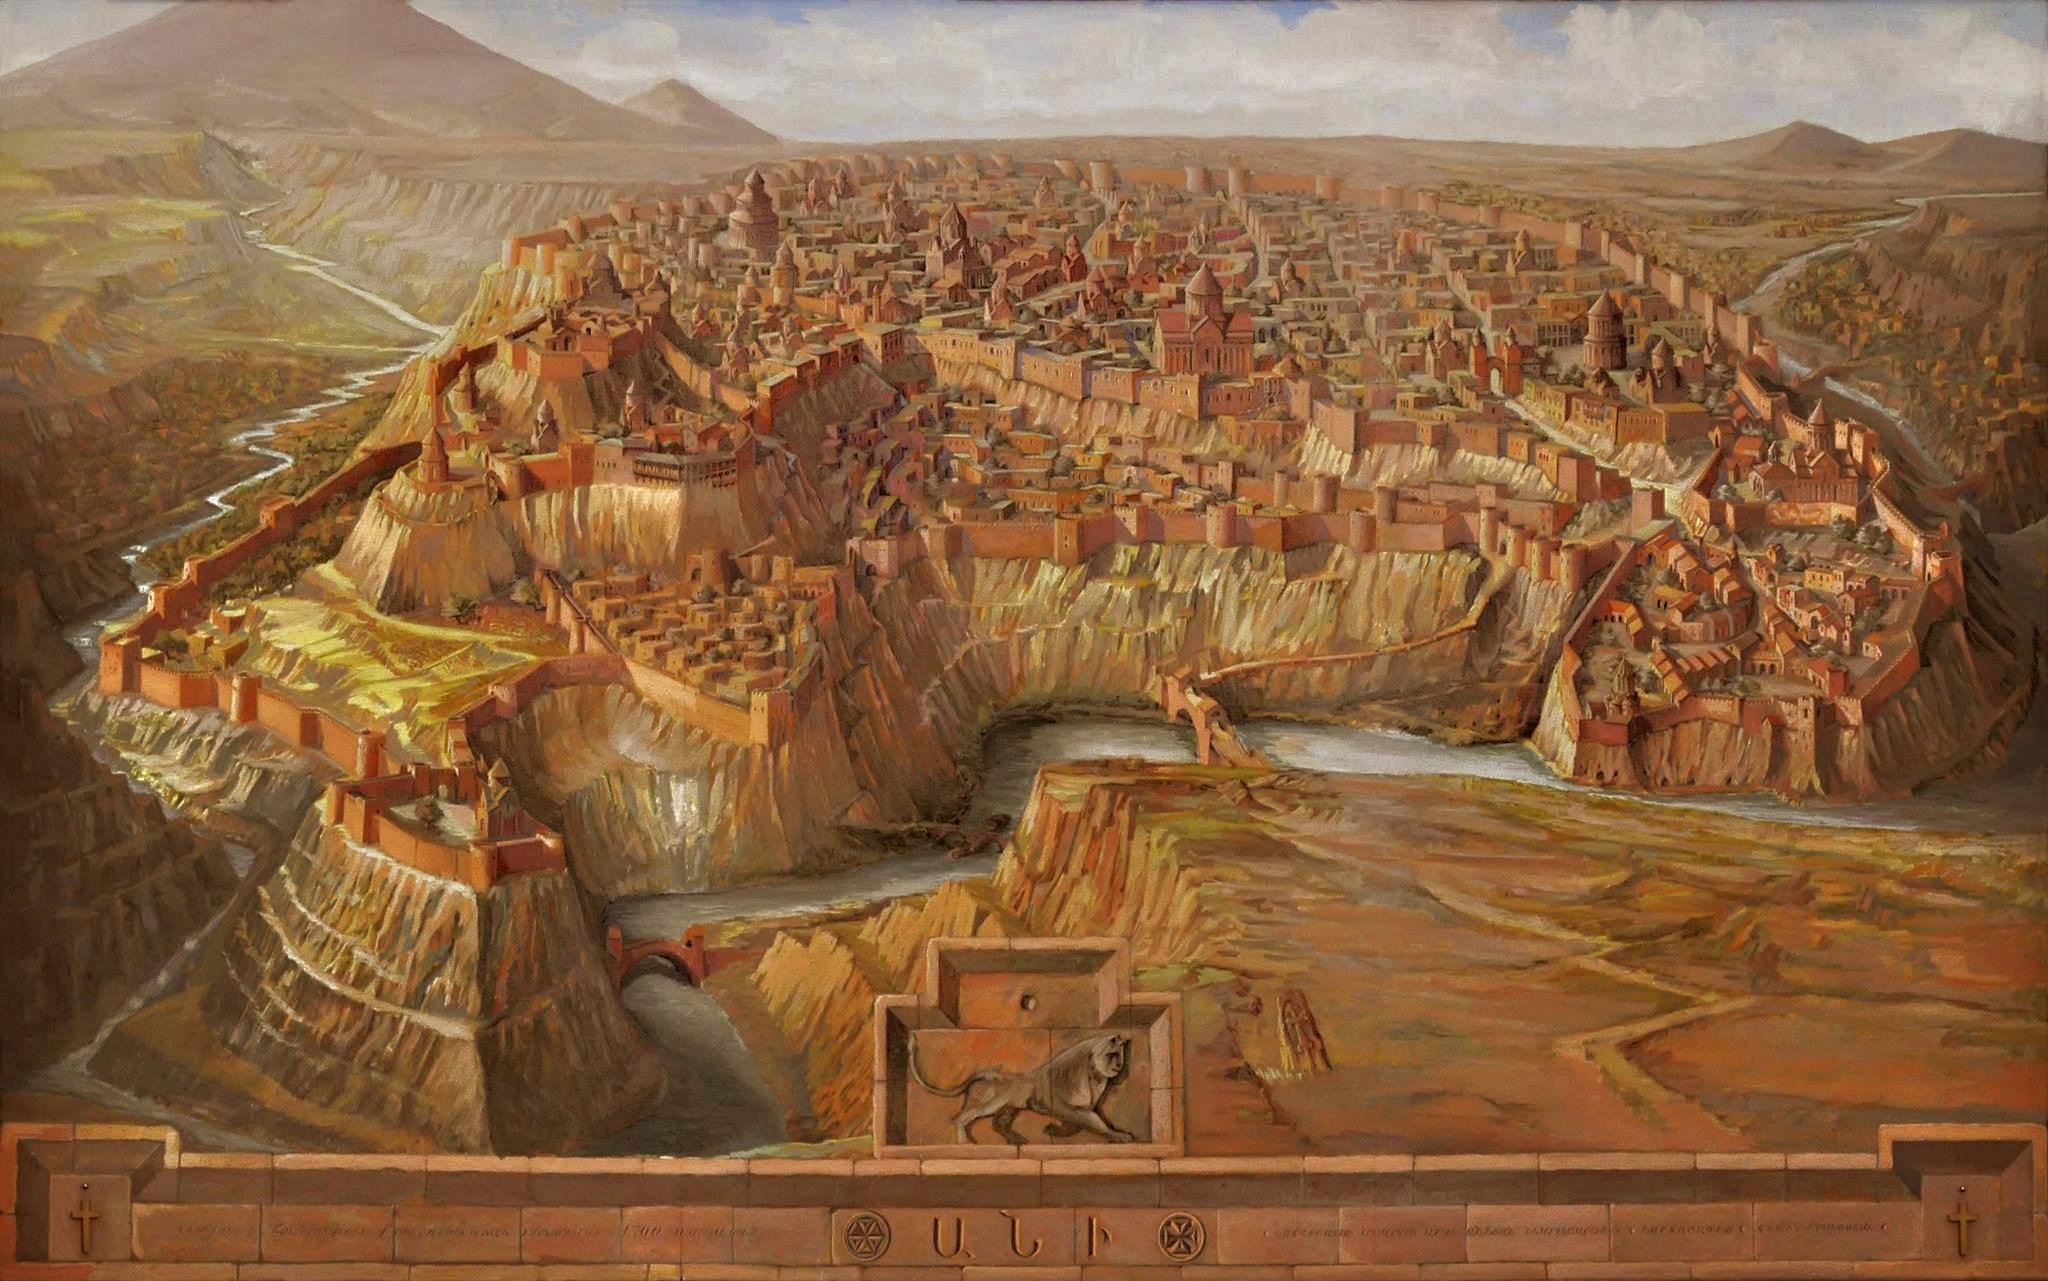 Ani, city of 1001 churches « Cradle of Civilization